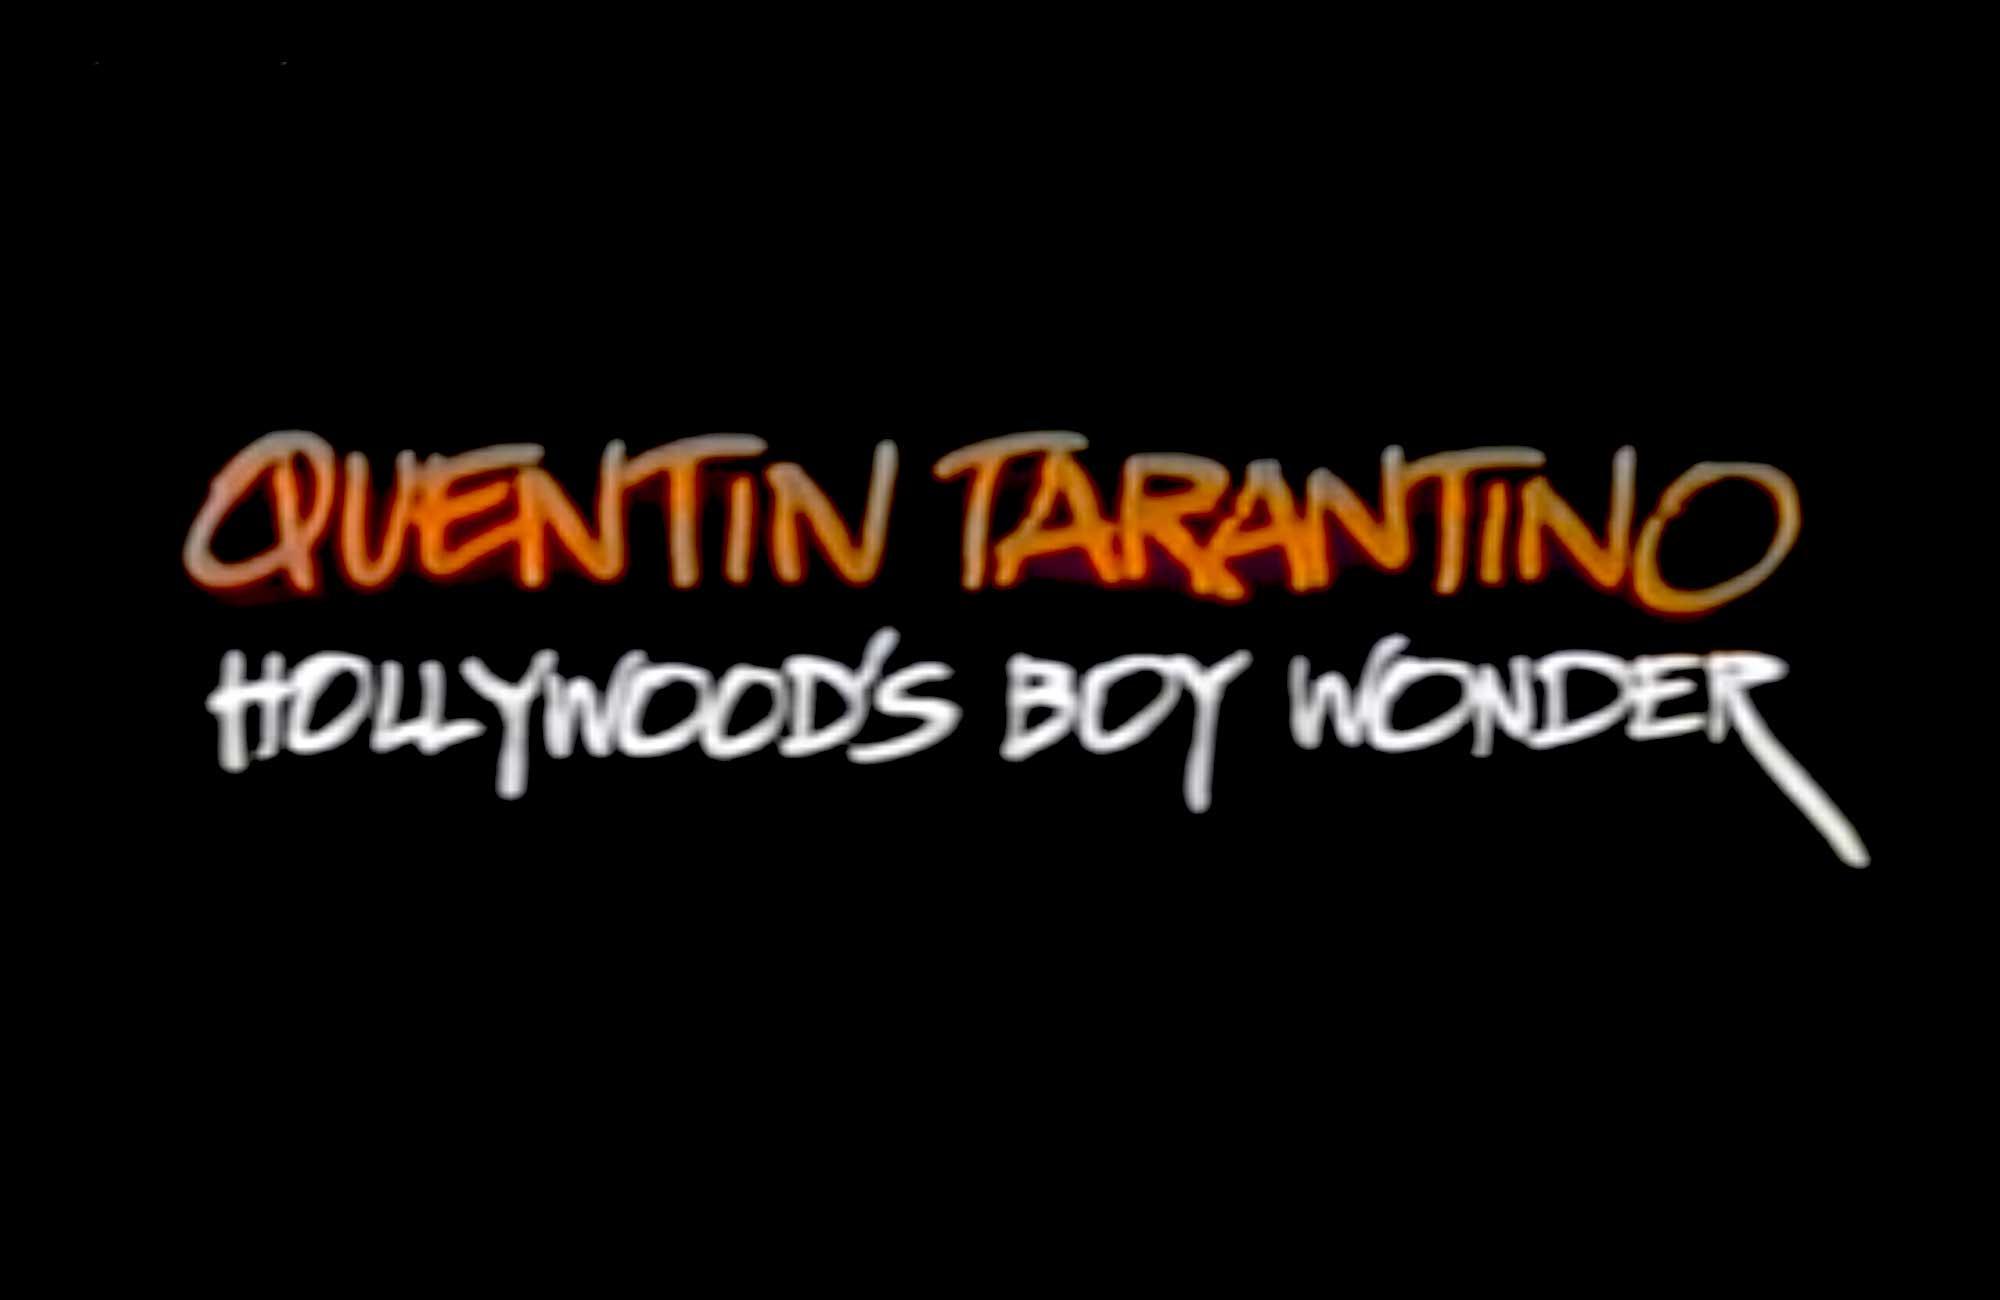 Hollywood's Boy Wonder